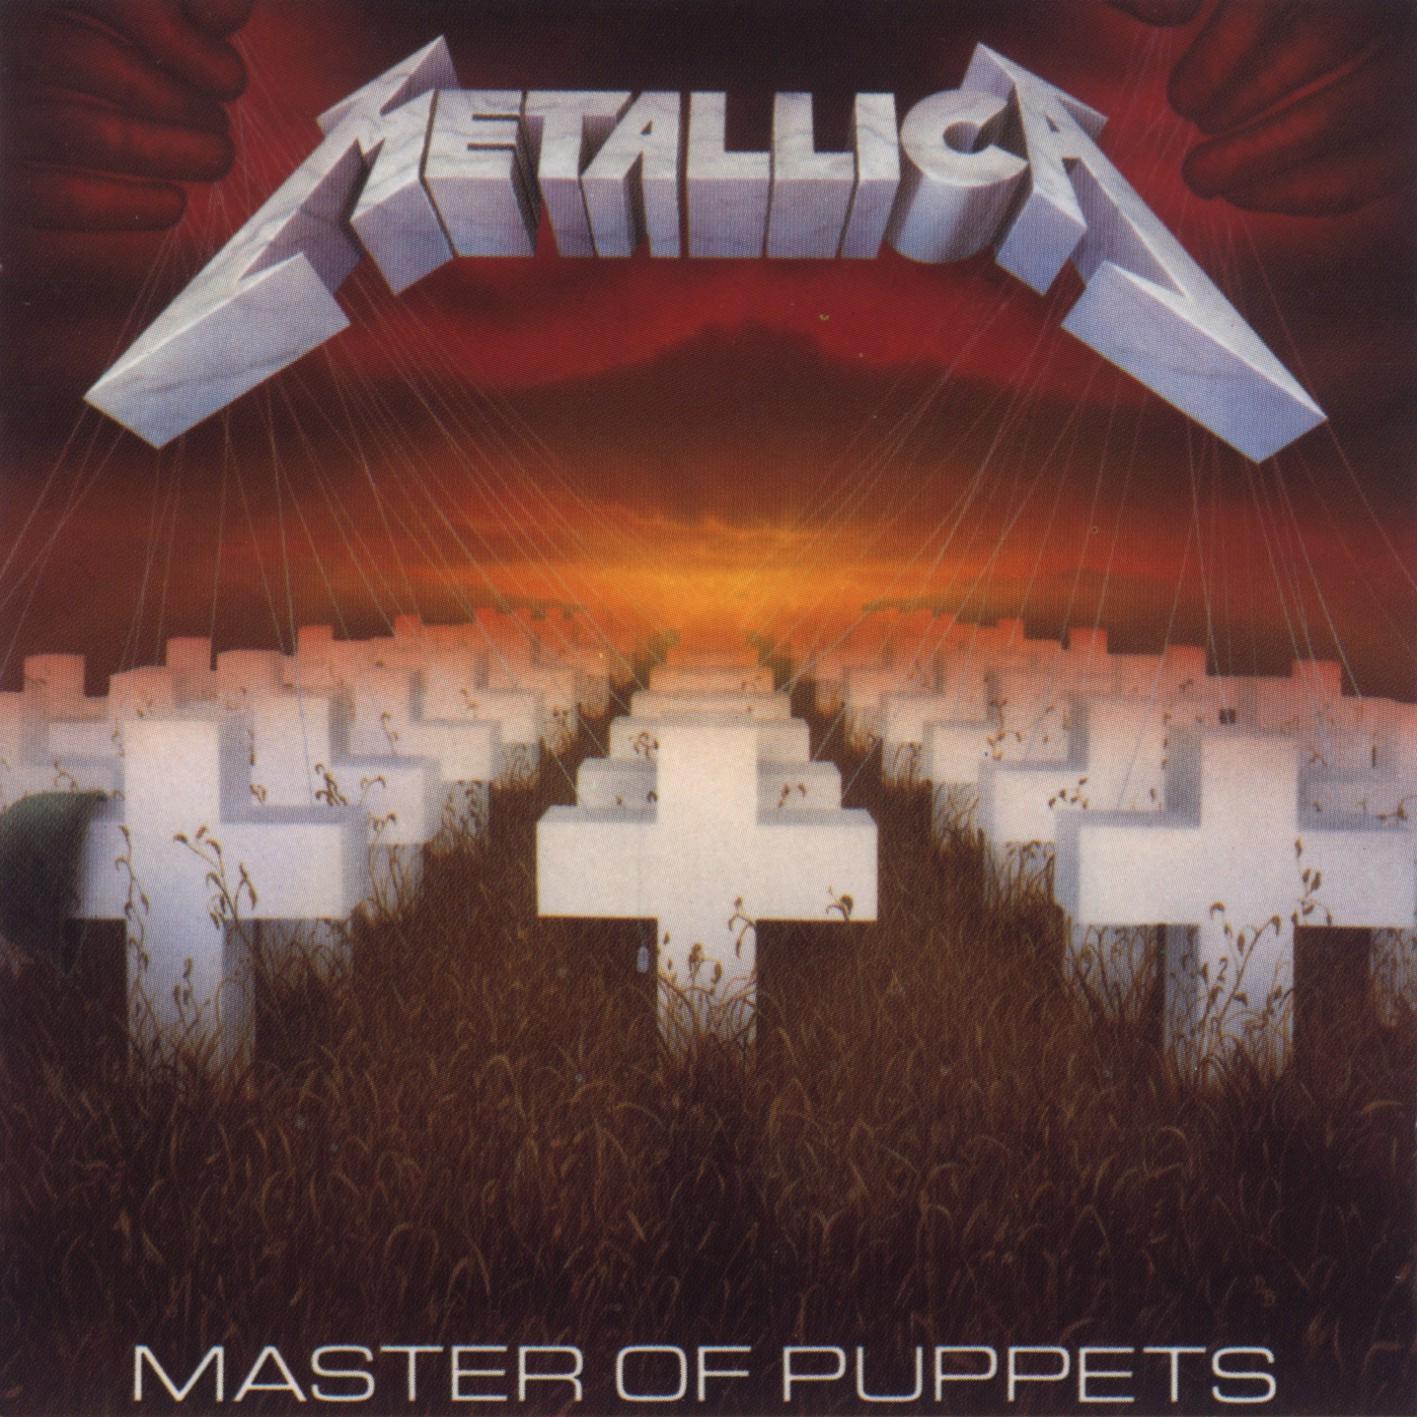 http://1.bp.blogspot.com/_f2iAGRf_Ioo/TMGo3QVUsrI/AAAAAAAACHc/JTo67eiqLF0/s1600/Metallica+-+1986+-+Master+Of+Puppets+-+Front.jpg